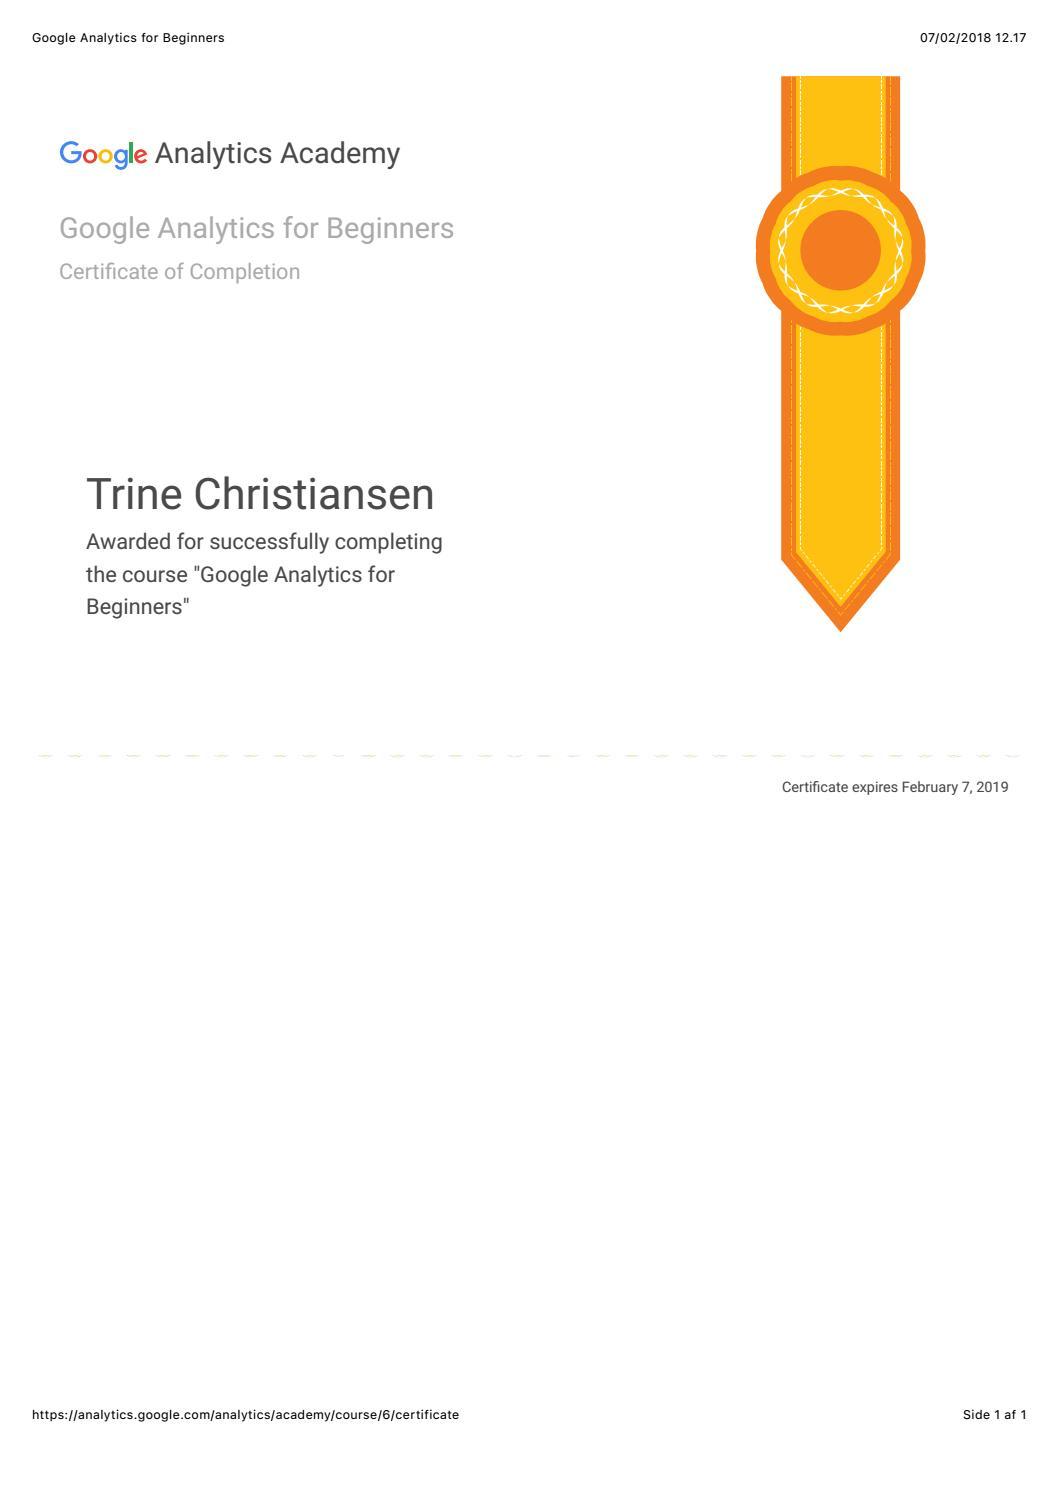 Google Analytics Certification For Beginners By Trine Christiansen